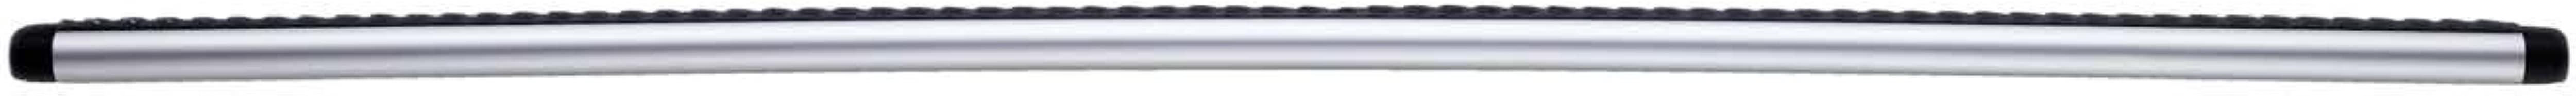 Best thule aero bar rubber strip Reviews